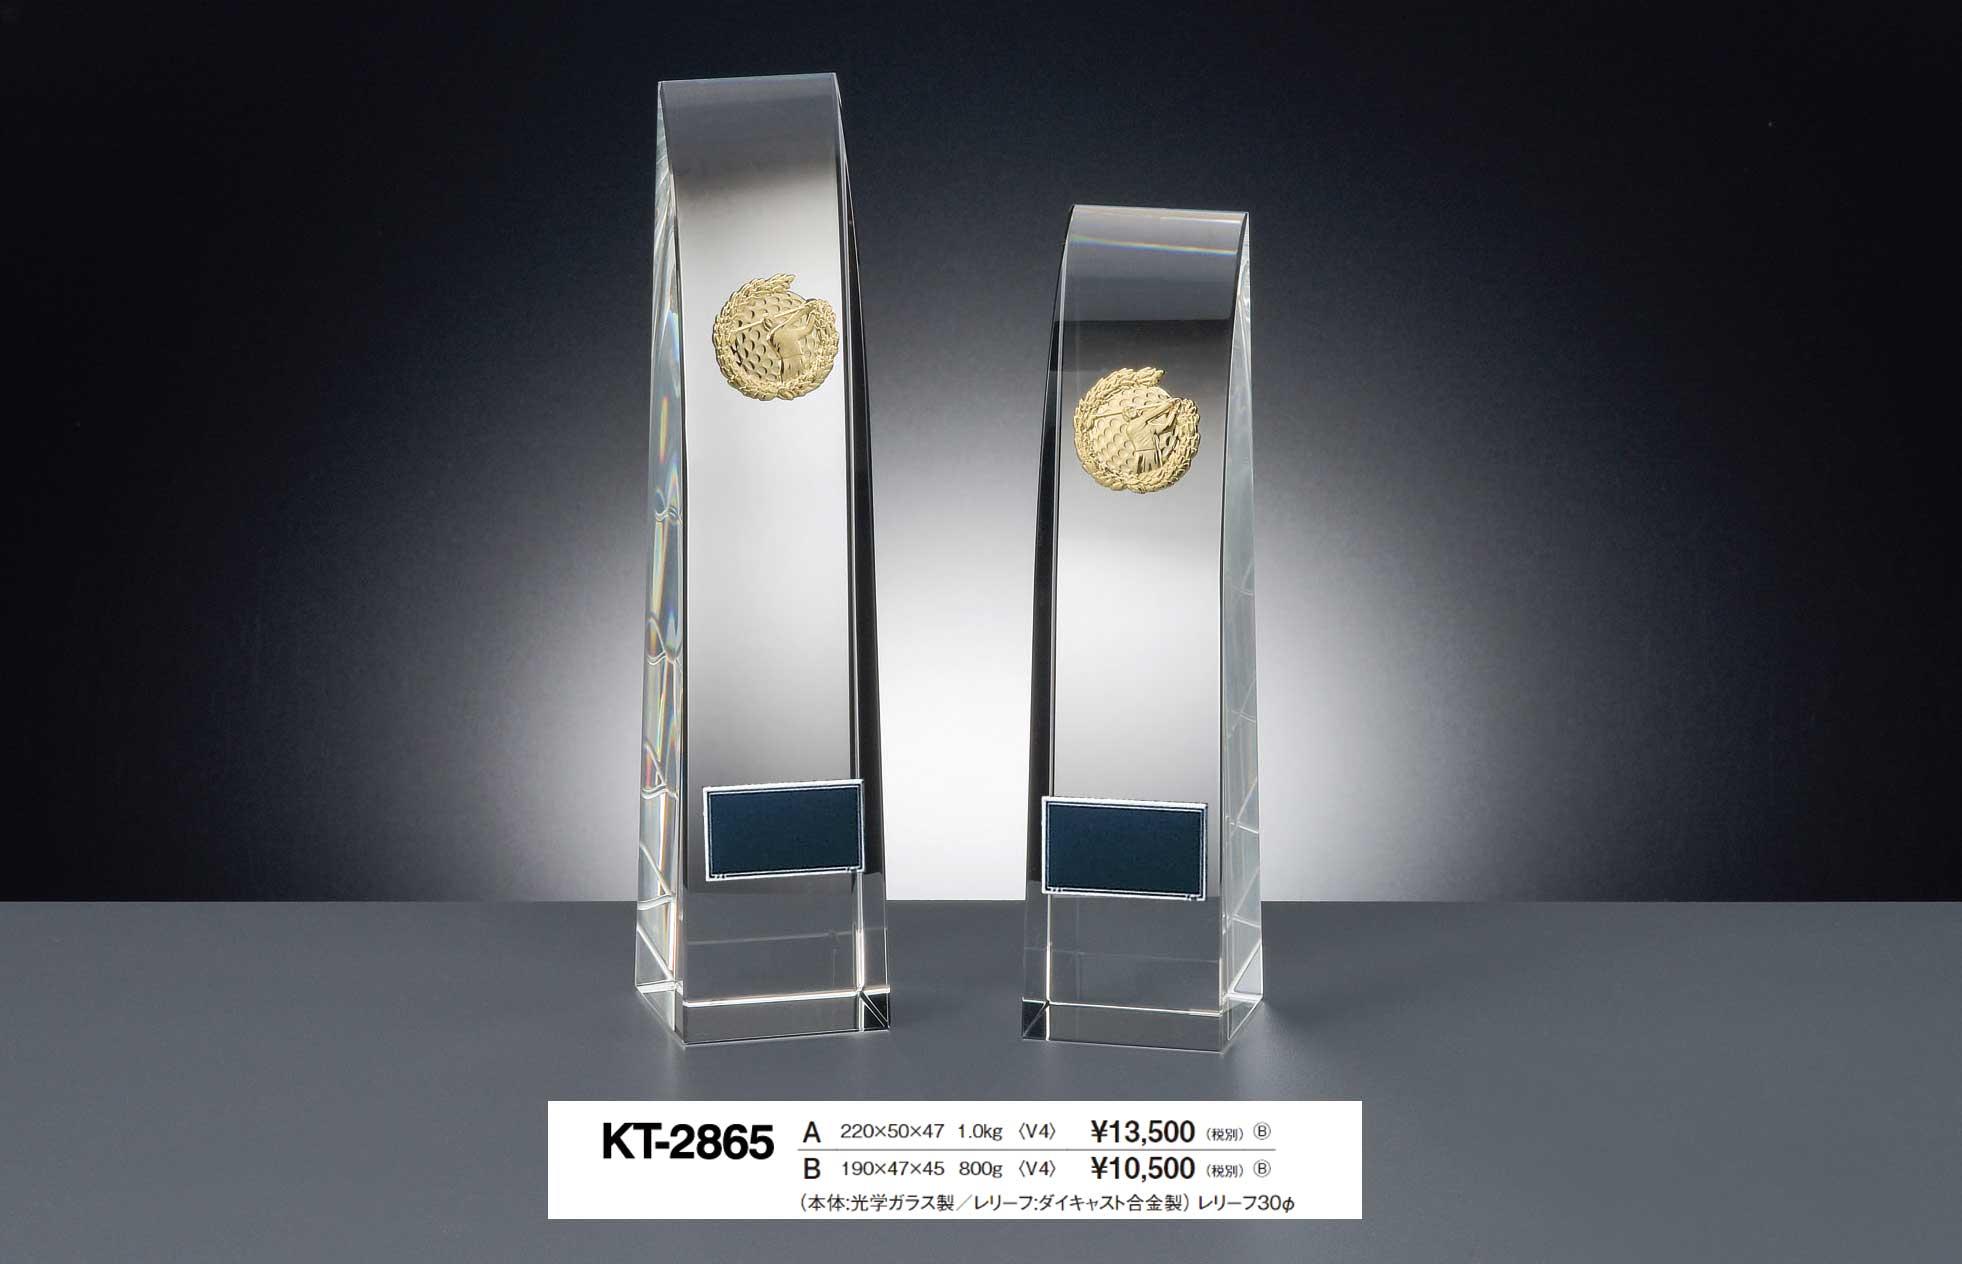 KT2865